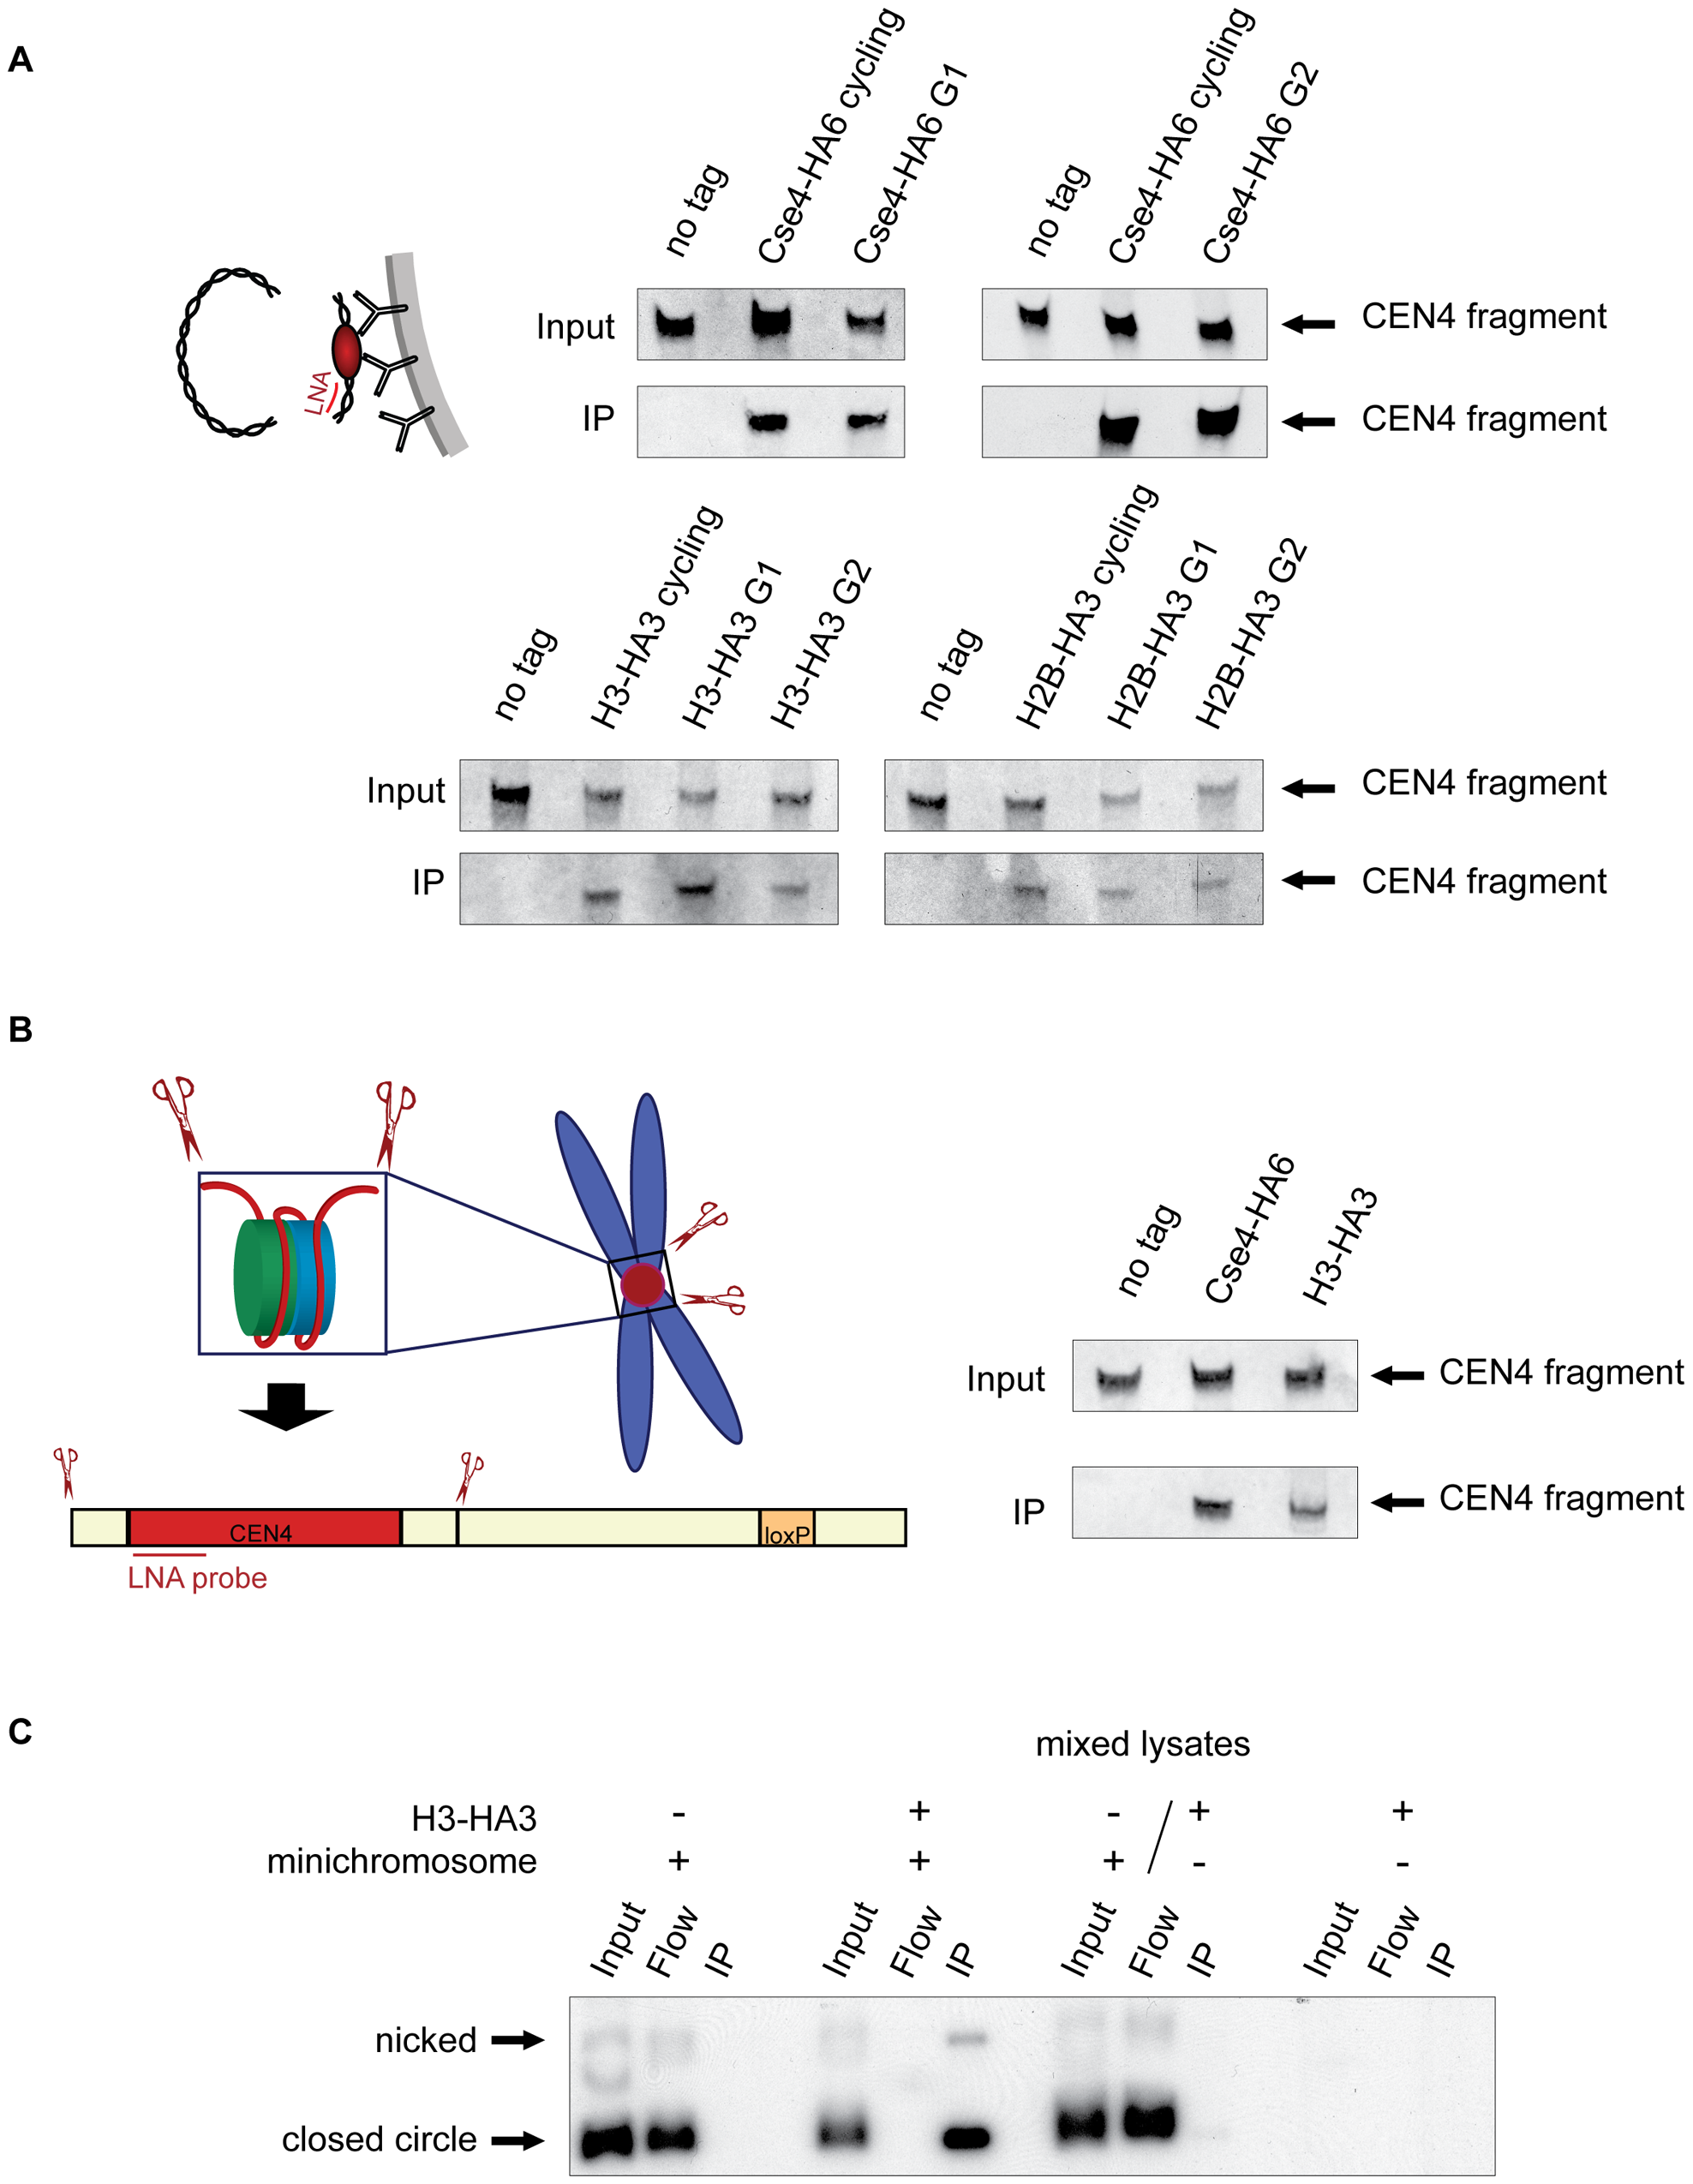 Histone H3 localizes to the centromeric DNA.